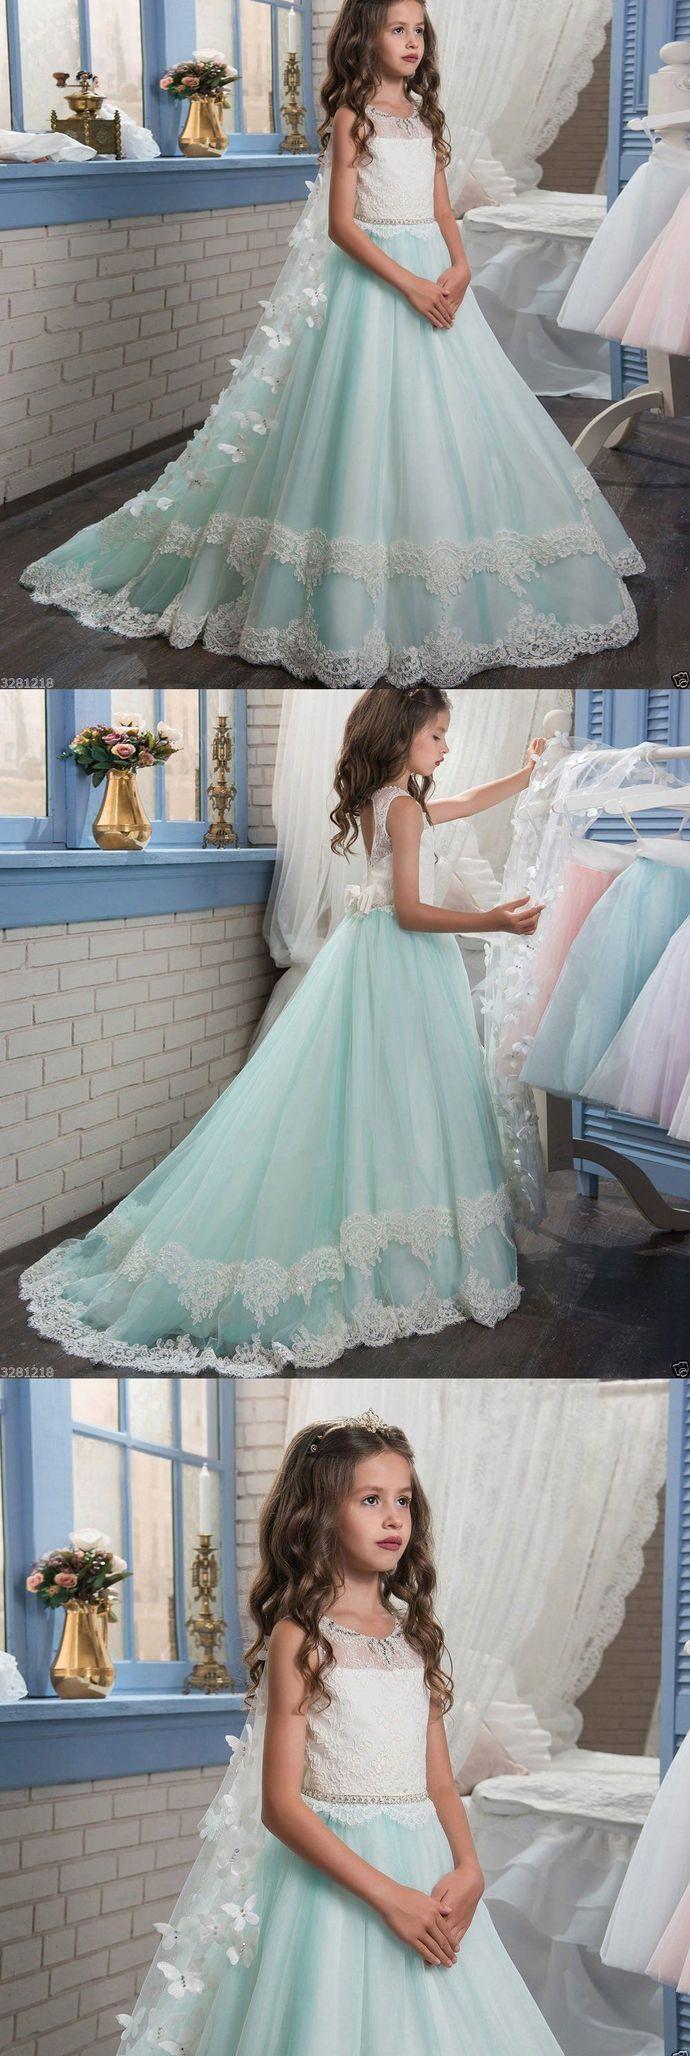 Blue flower girl dresses princess pageant first communion dresses